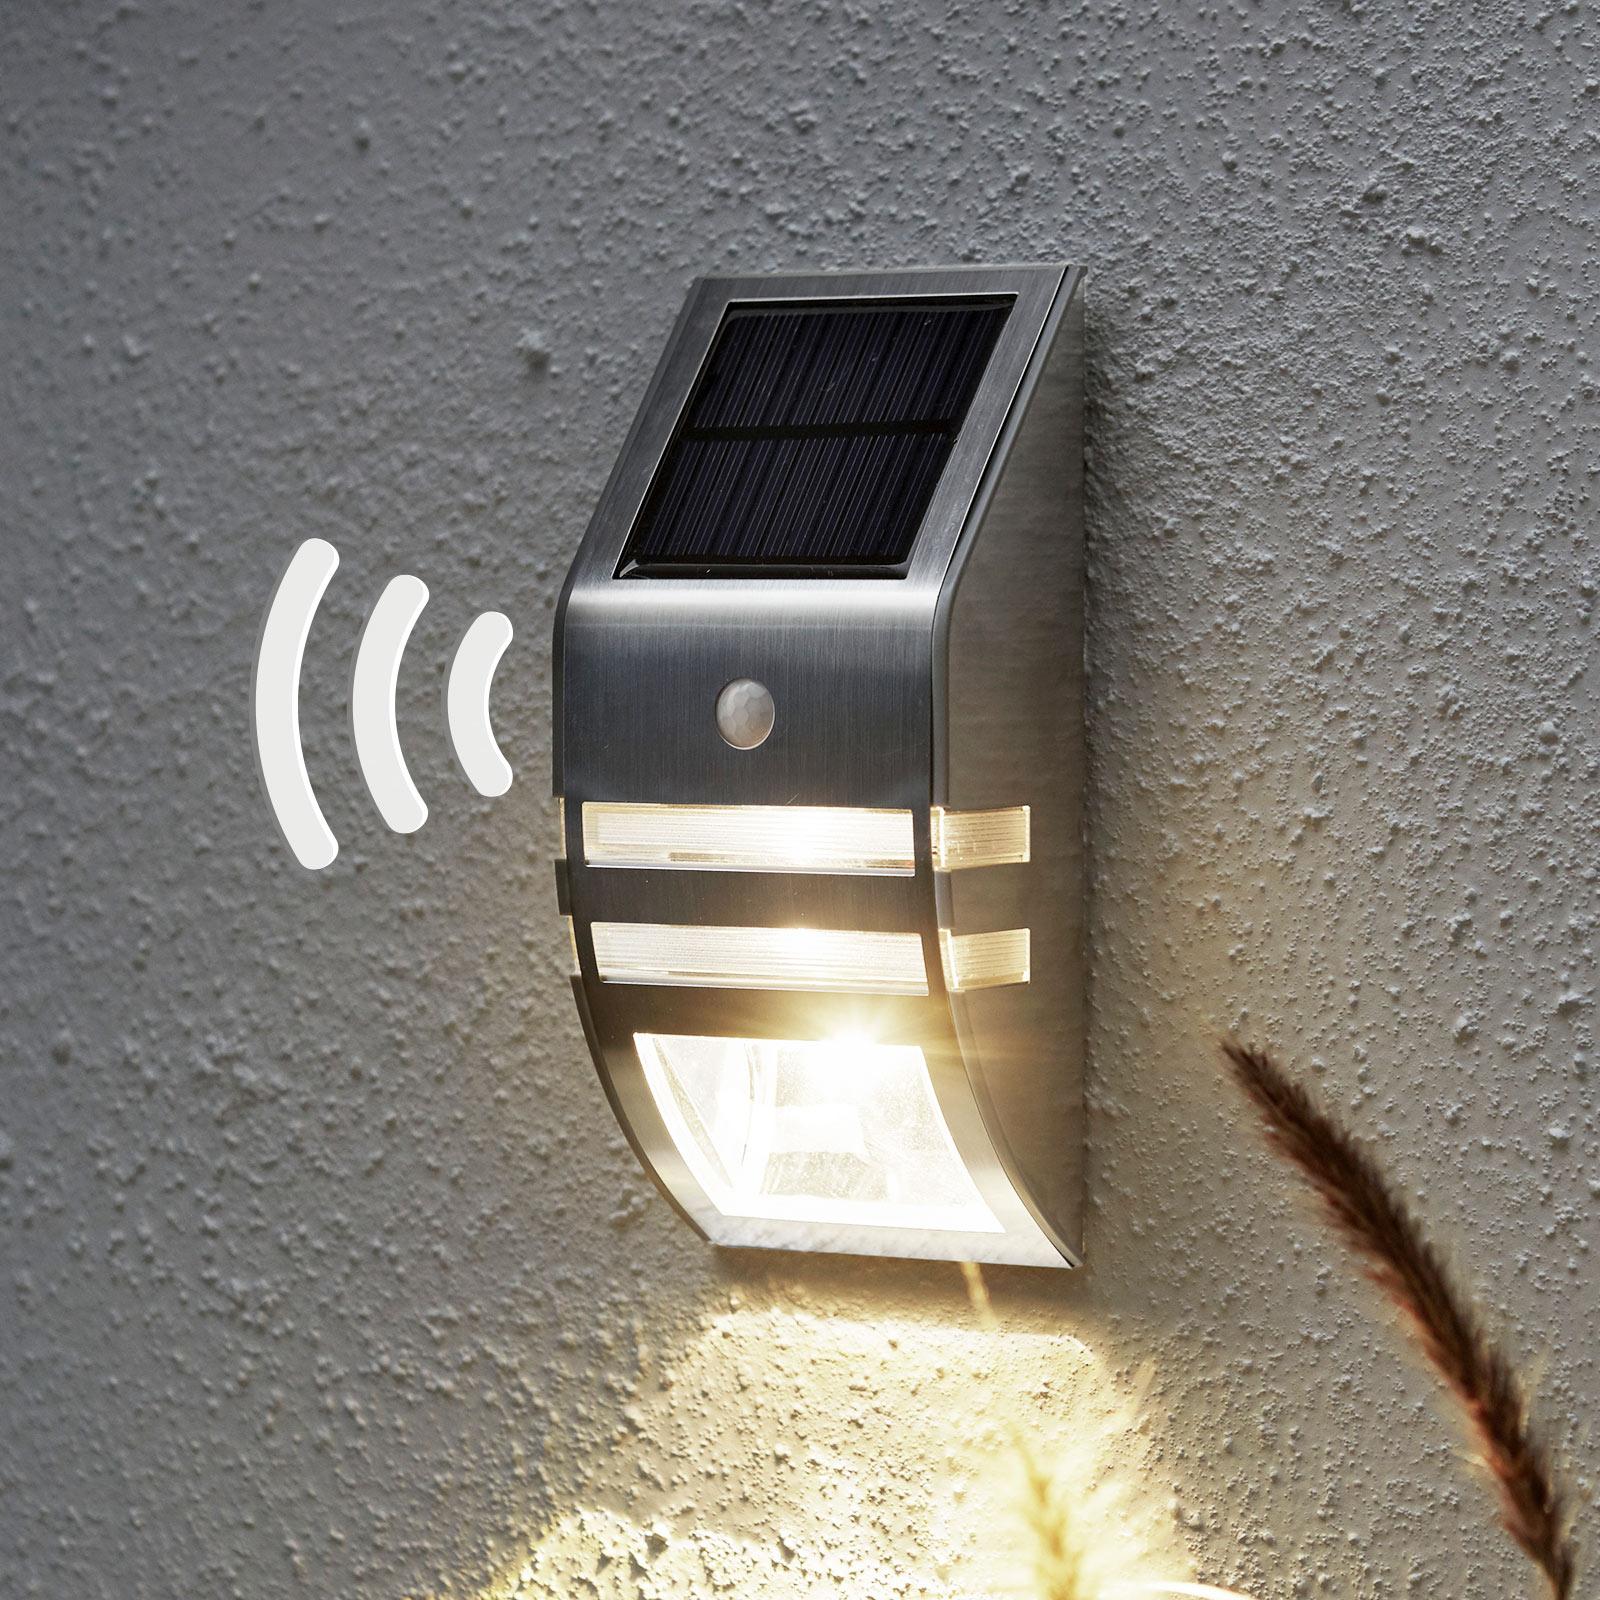 Ścienna lampa solarna LED Wally, czujnik ruchu